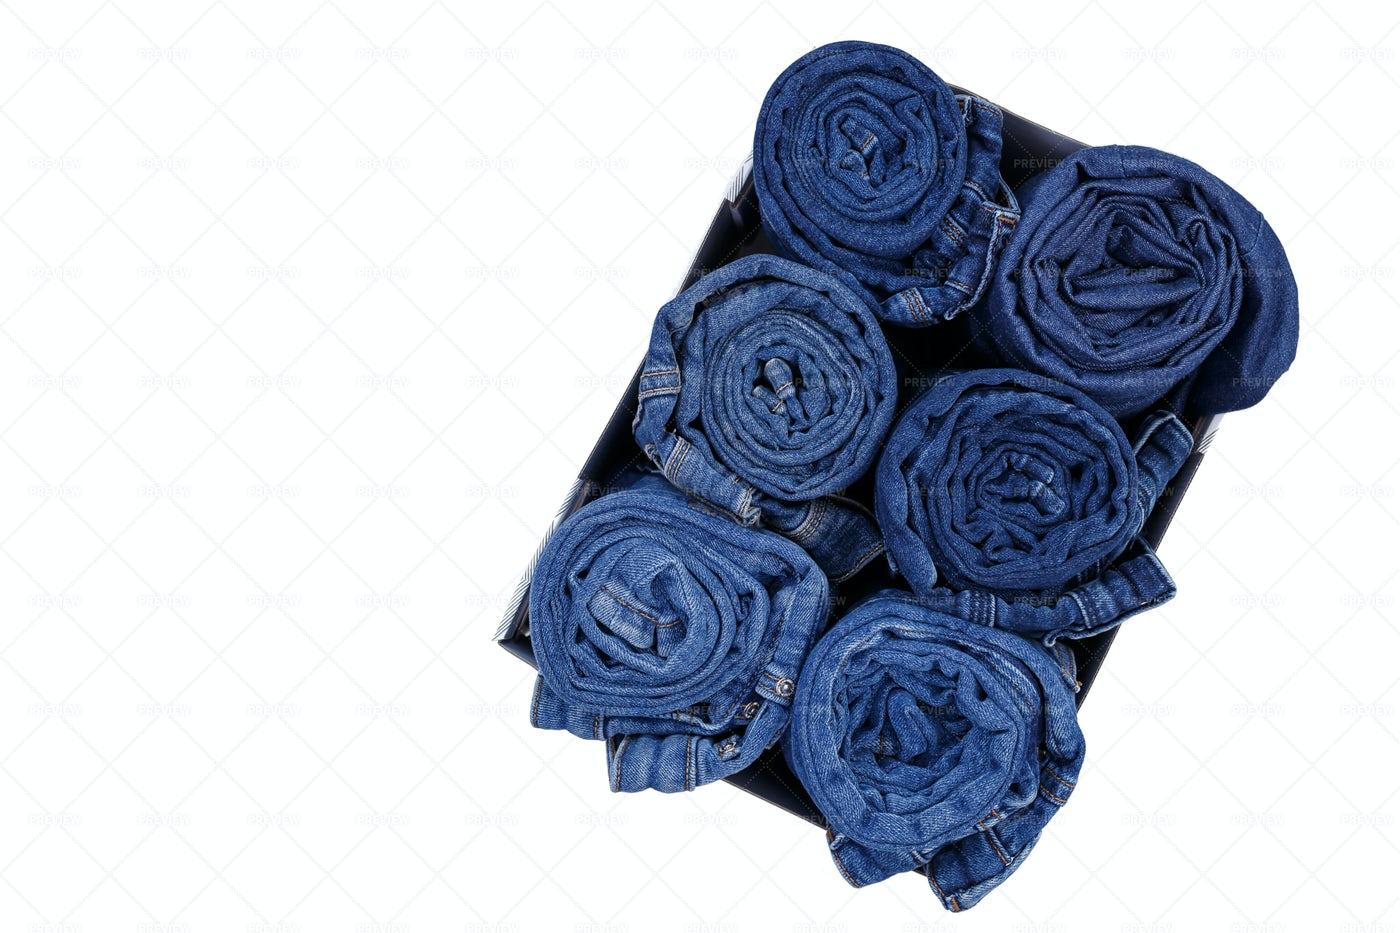 Denim Jeans In Box: Stock Photos